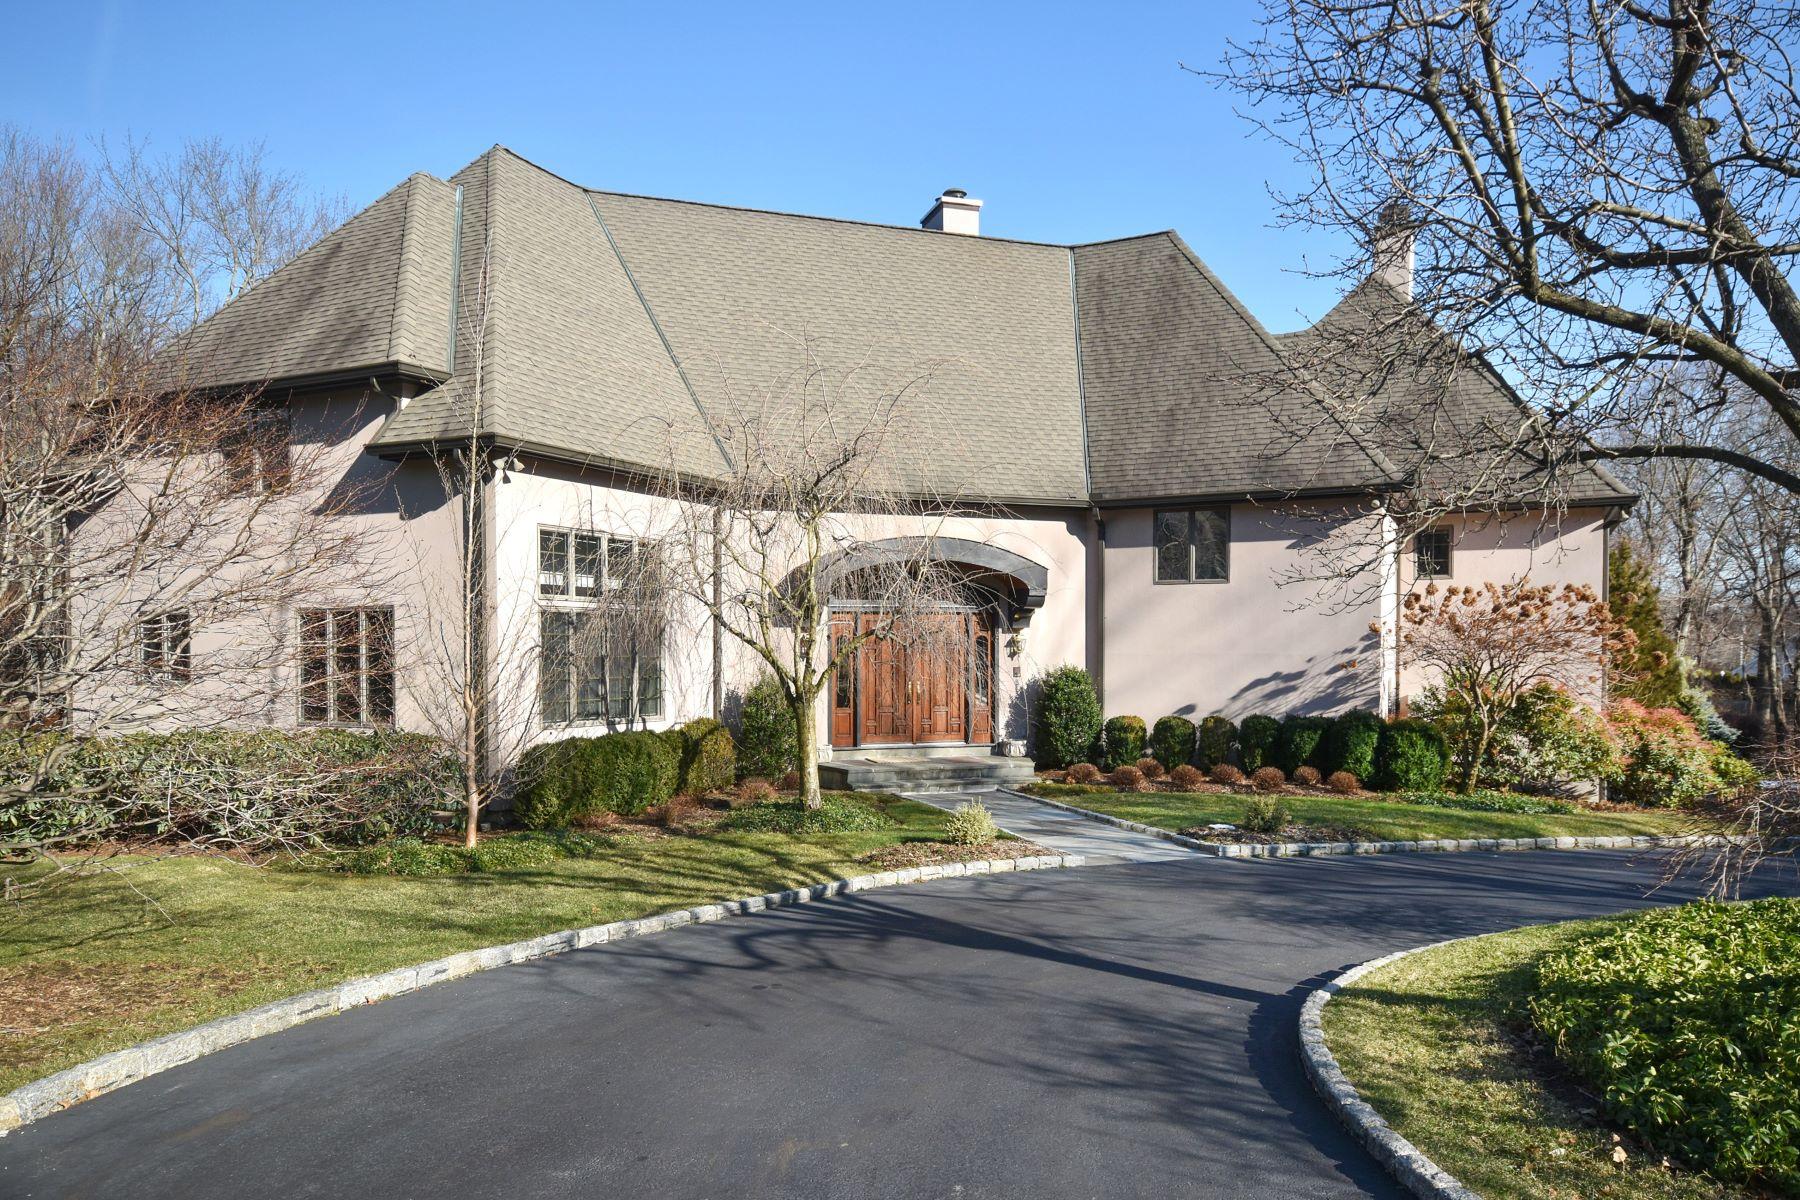 Casa para uma família para Venda às Private & Tranquil Yet Convenient To Town & Train 15 Bates Farm Lane Darien, Connecticut, 06820 Estados Unidos